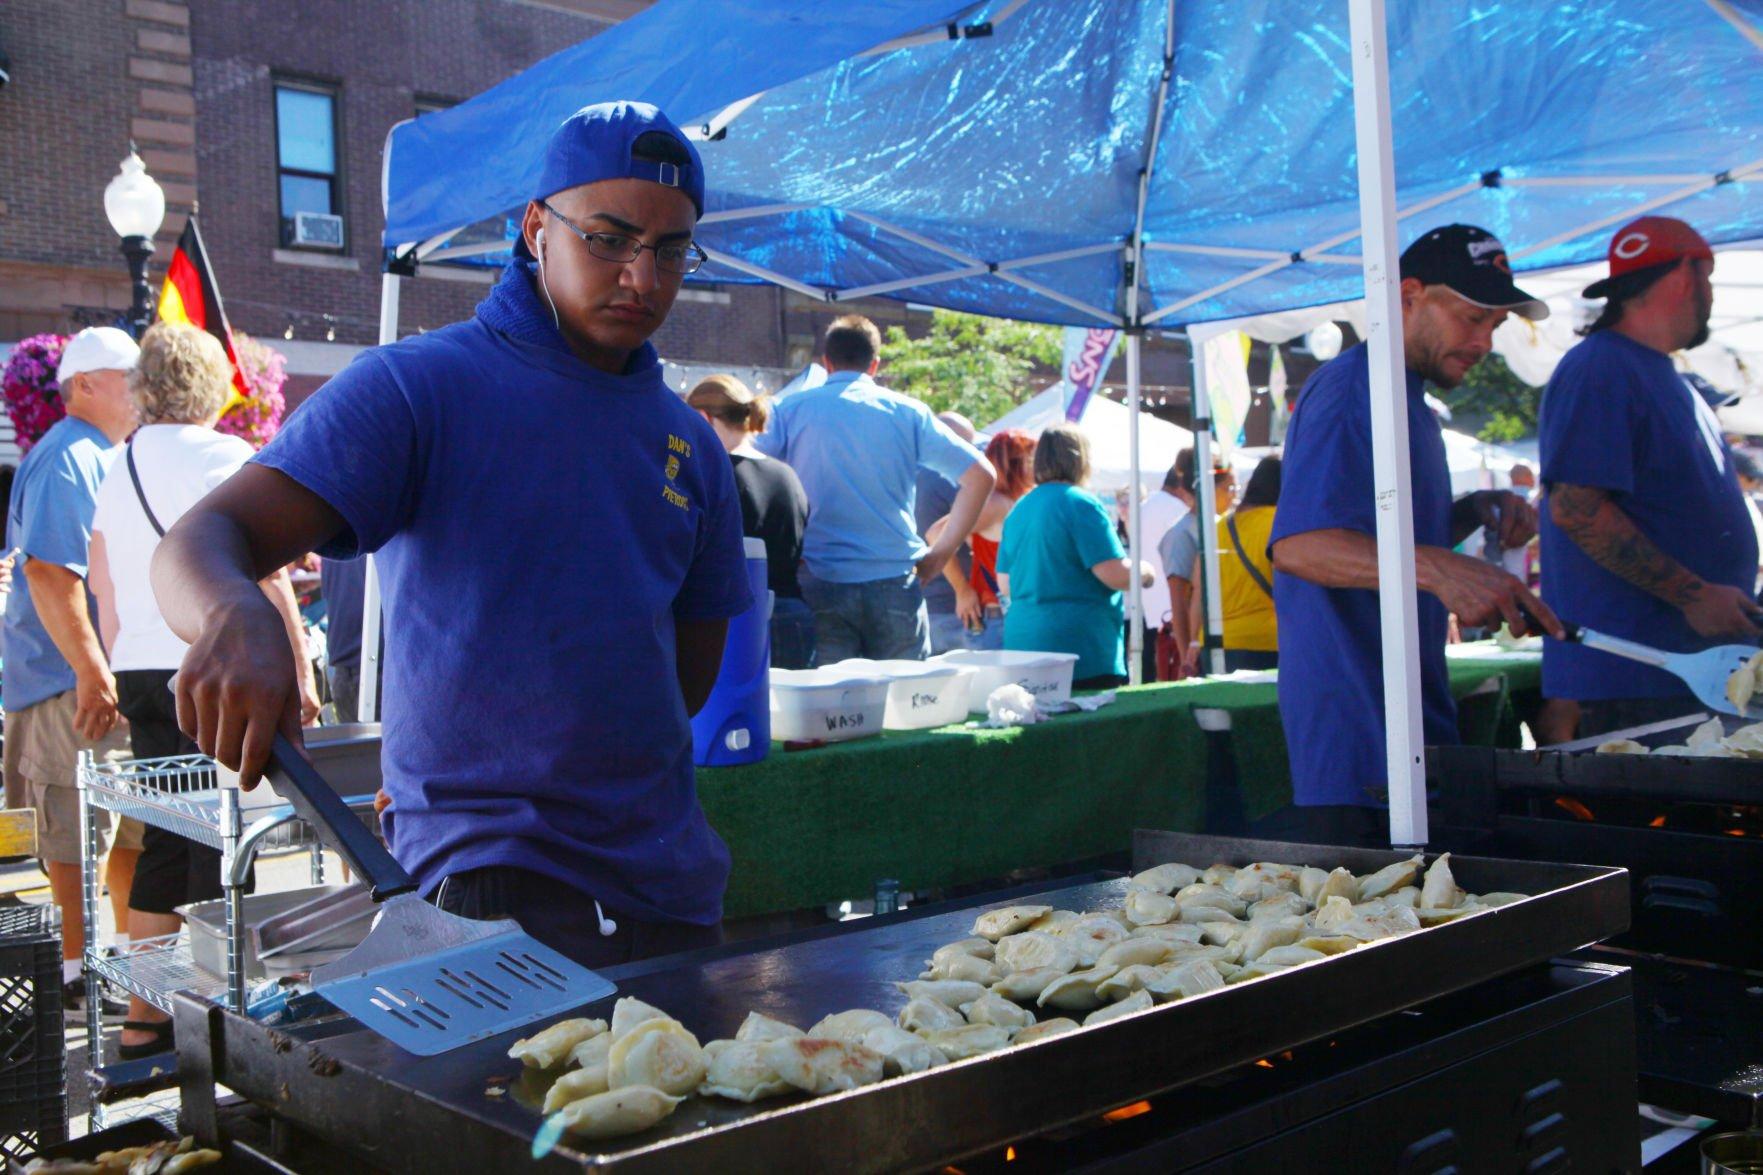 Local committee faces lawsuit threat over pierogi festival